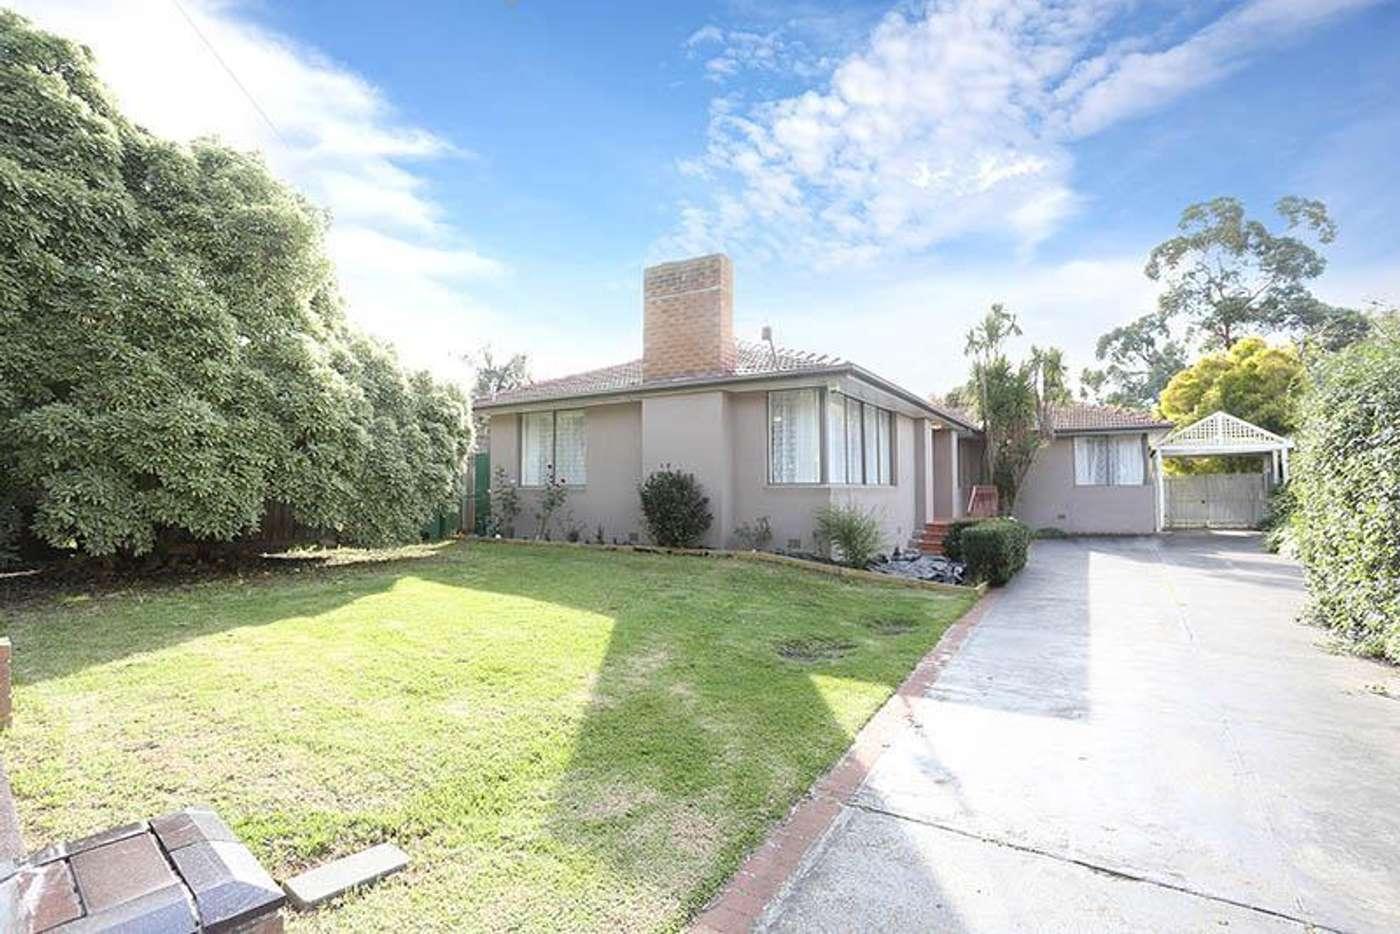 Main view of Homely house listing, 57 Elder Street, Watsonia VIC 3087